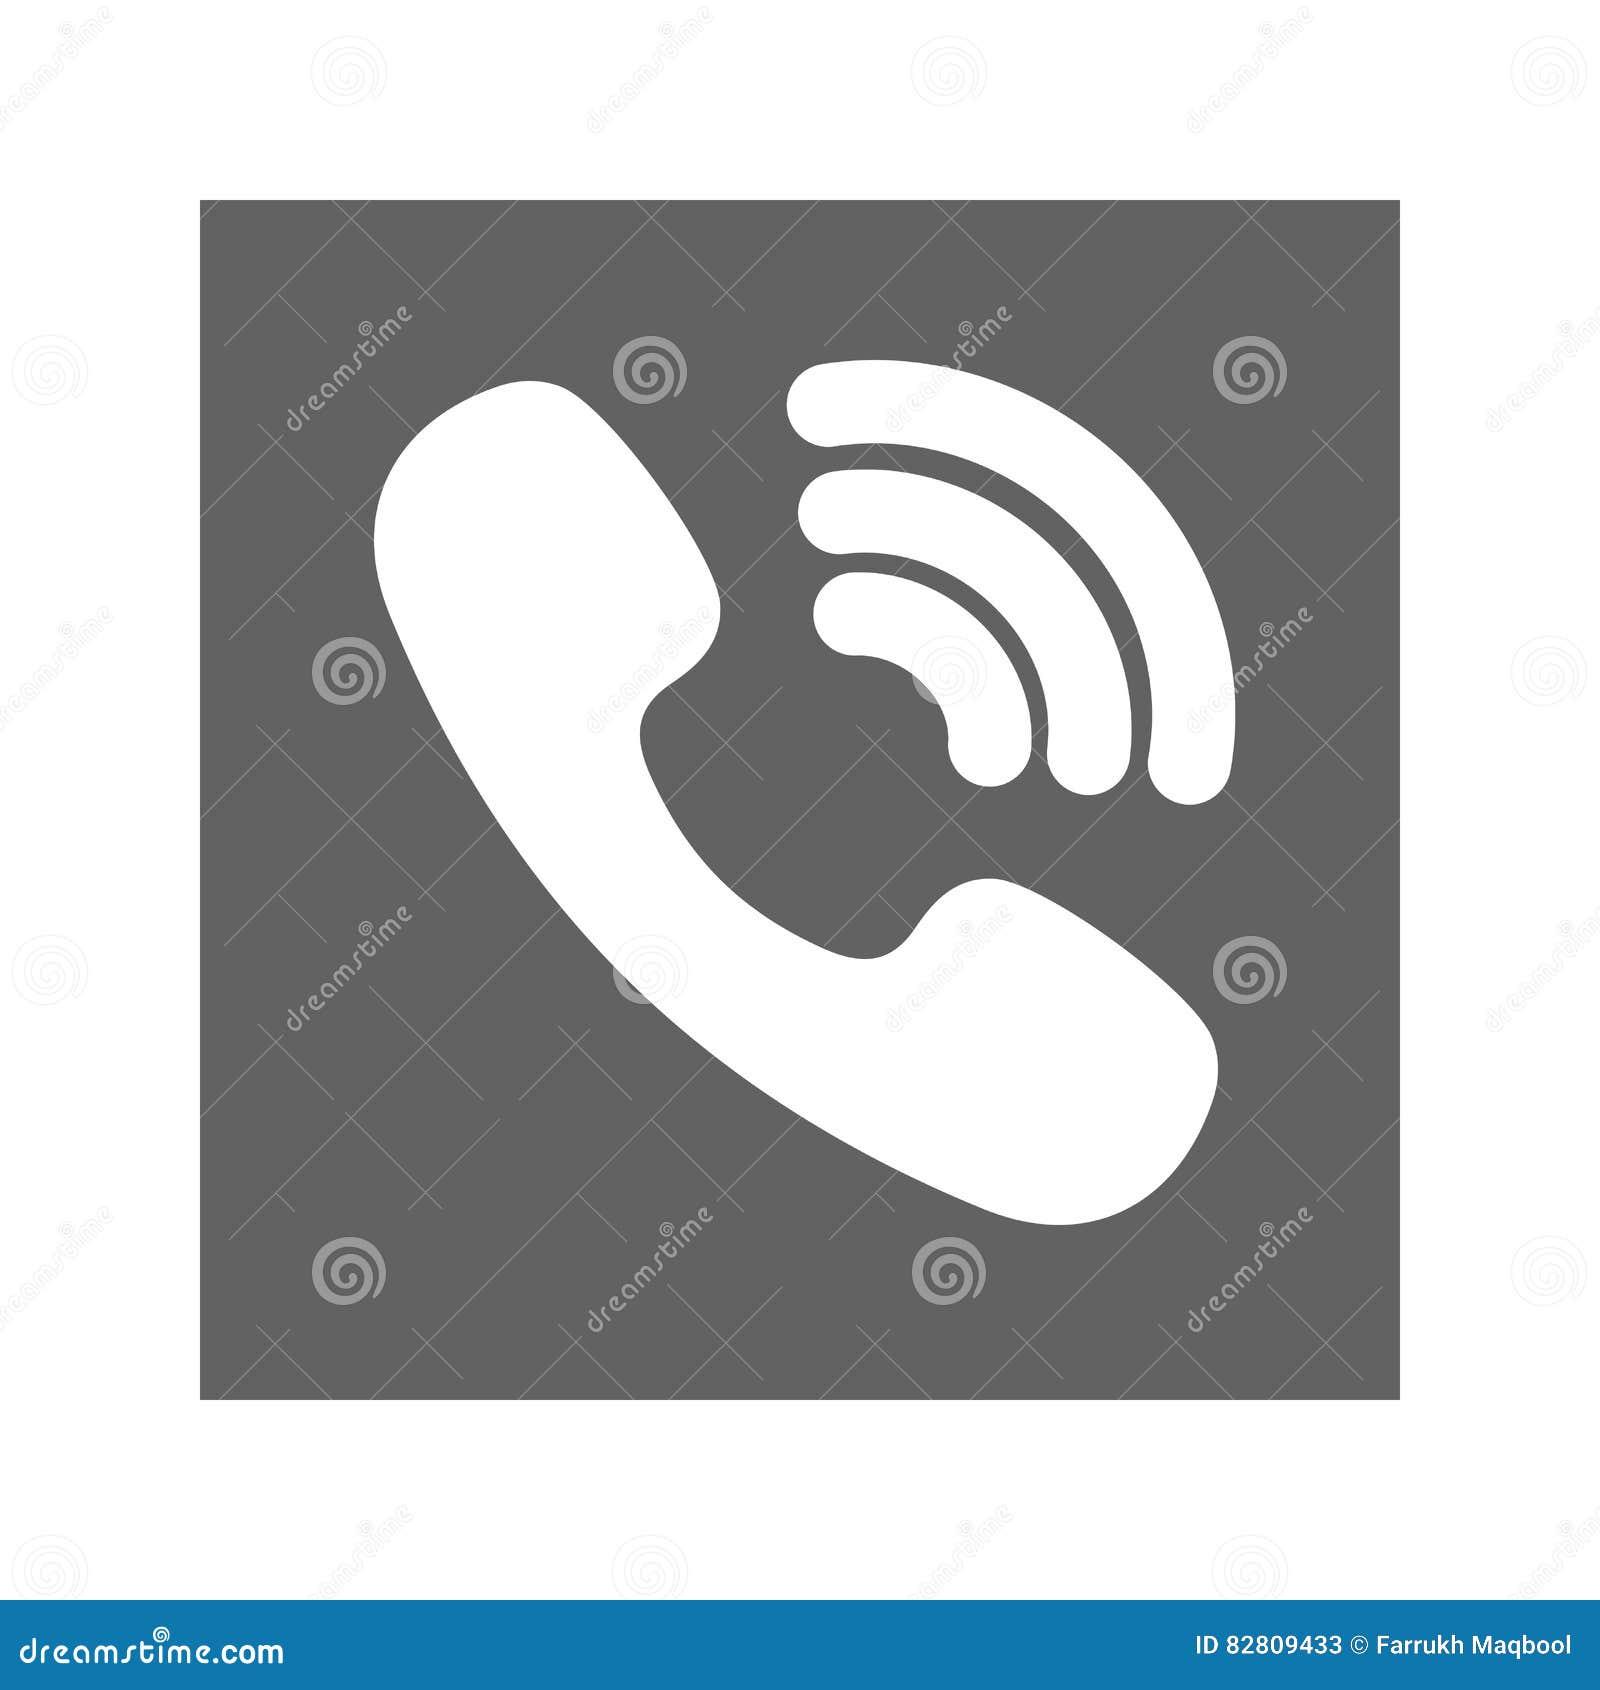 Viber Editorial Stock Photo Illustration Of Icon Message 82809433